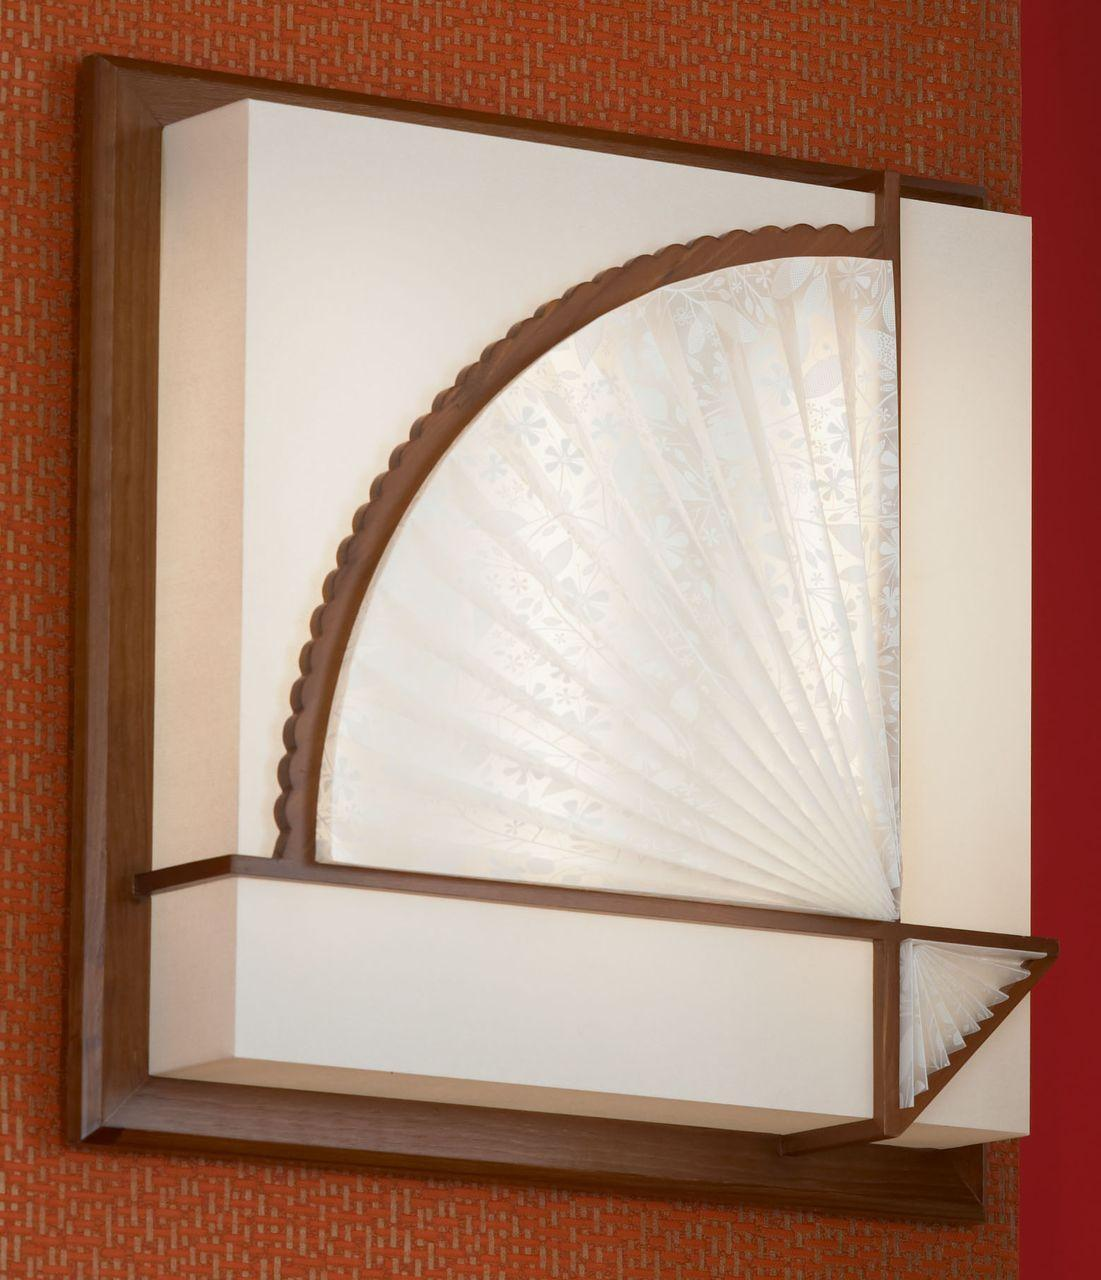 Настенный светильник Lussole Barbara LSF-9012-03 skyjoyce xenon hir2 9012 bulb headlight kit hid projector lens 9012 4300k 6000k levin headlight hir2 9012 5000k hid kit